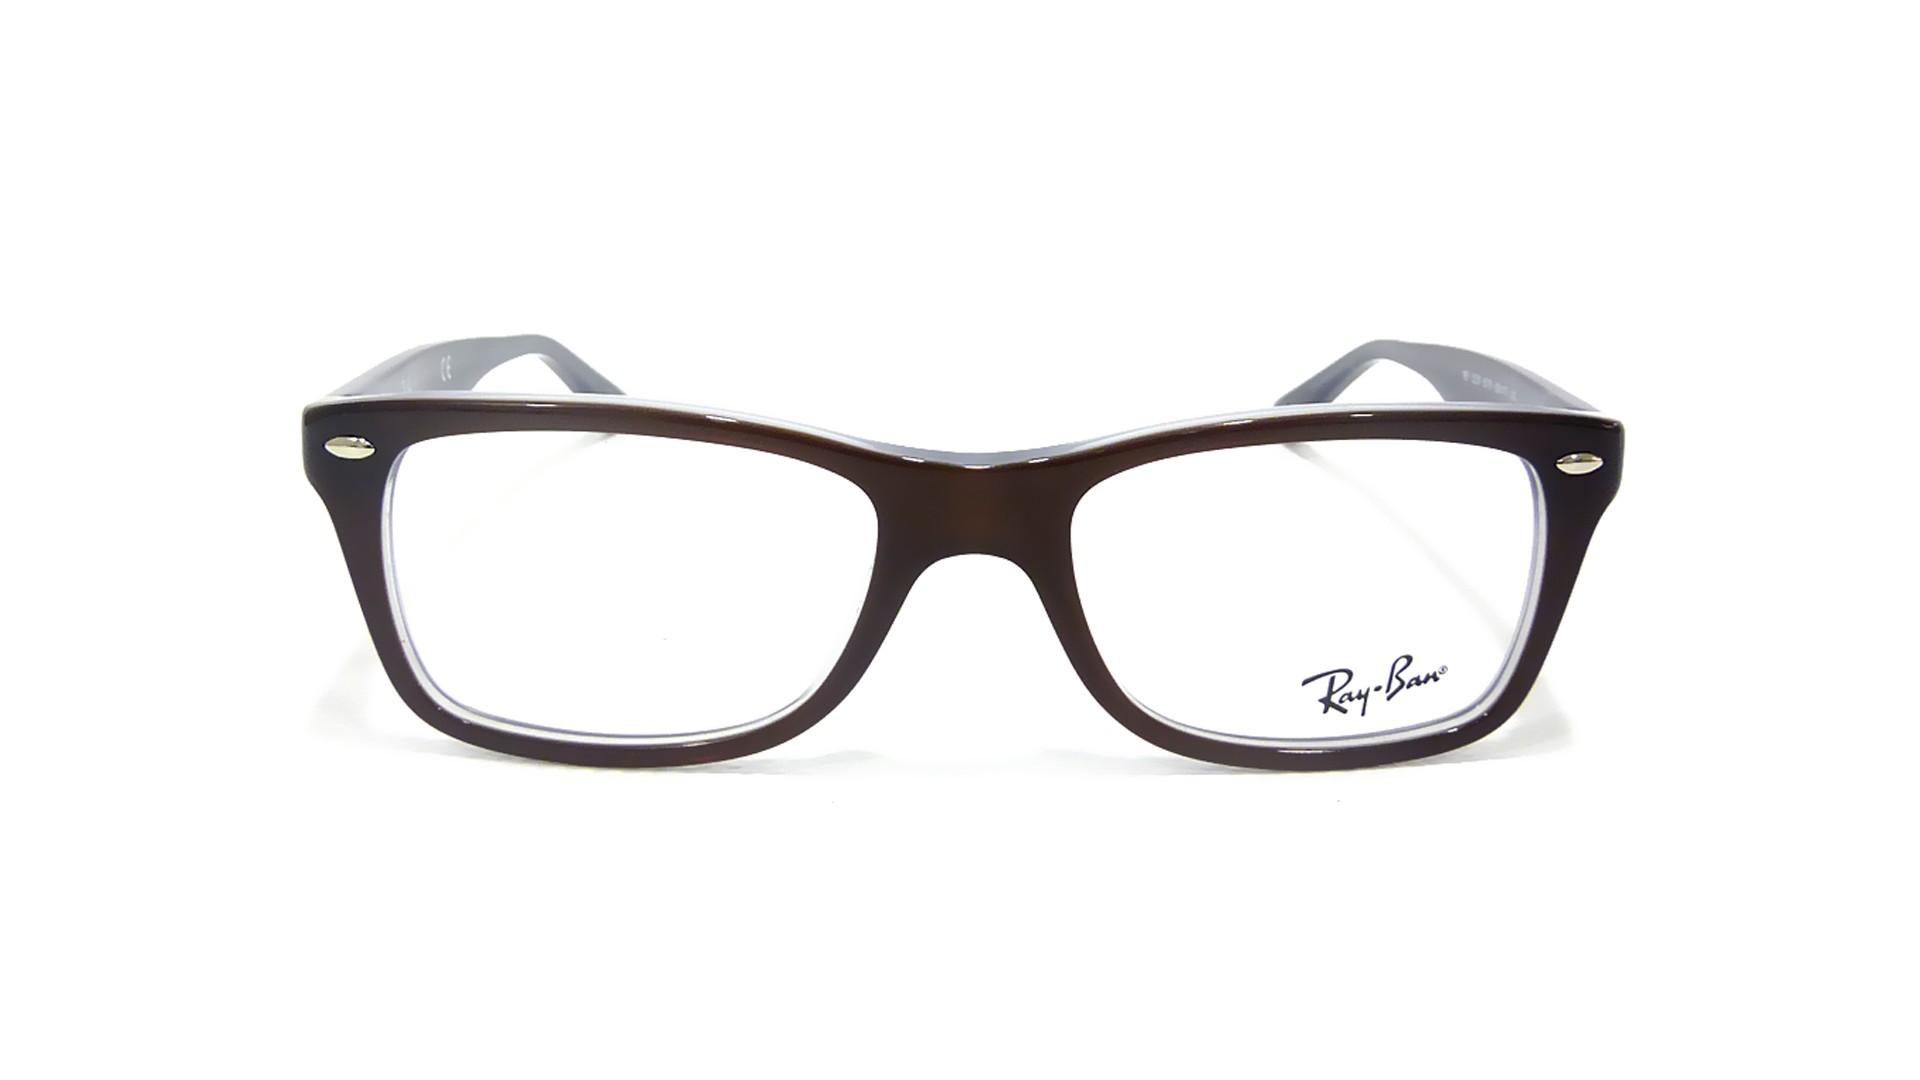 dd693f23a6 Ray Bans Rb 3293 63 Sunglasses At Night « Heritage Malta